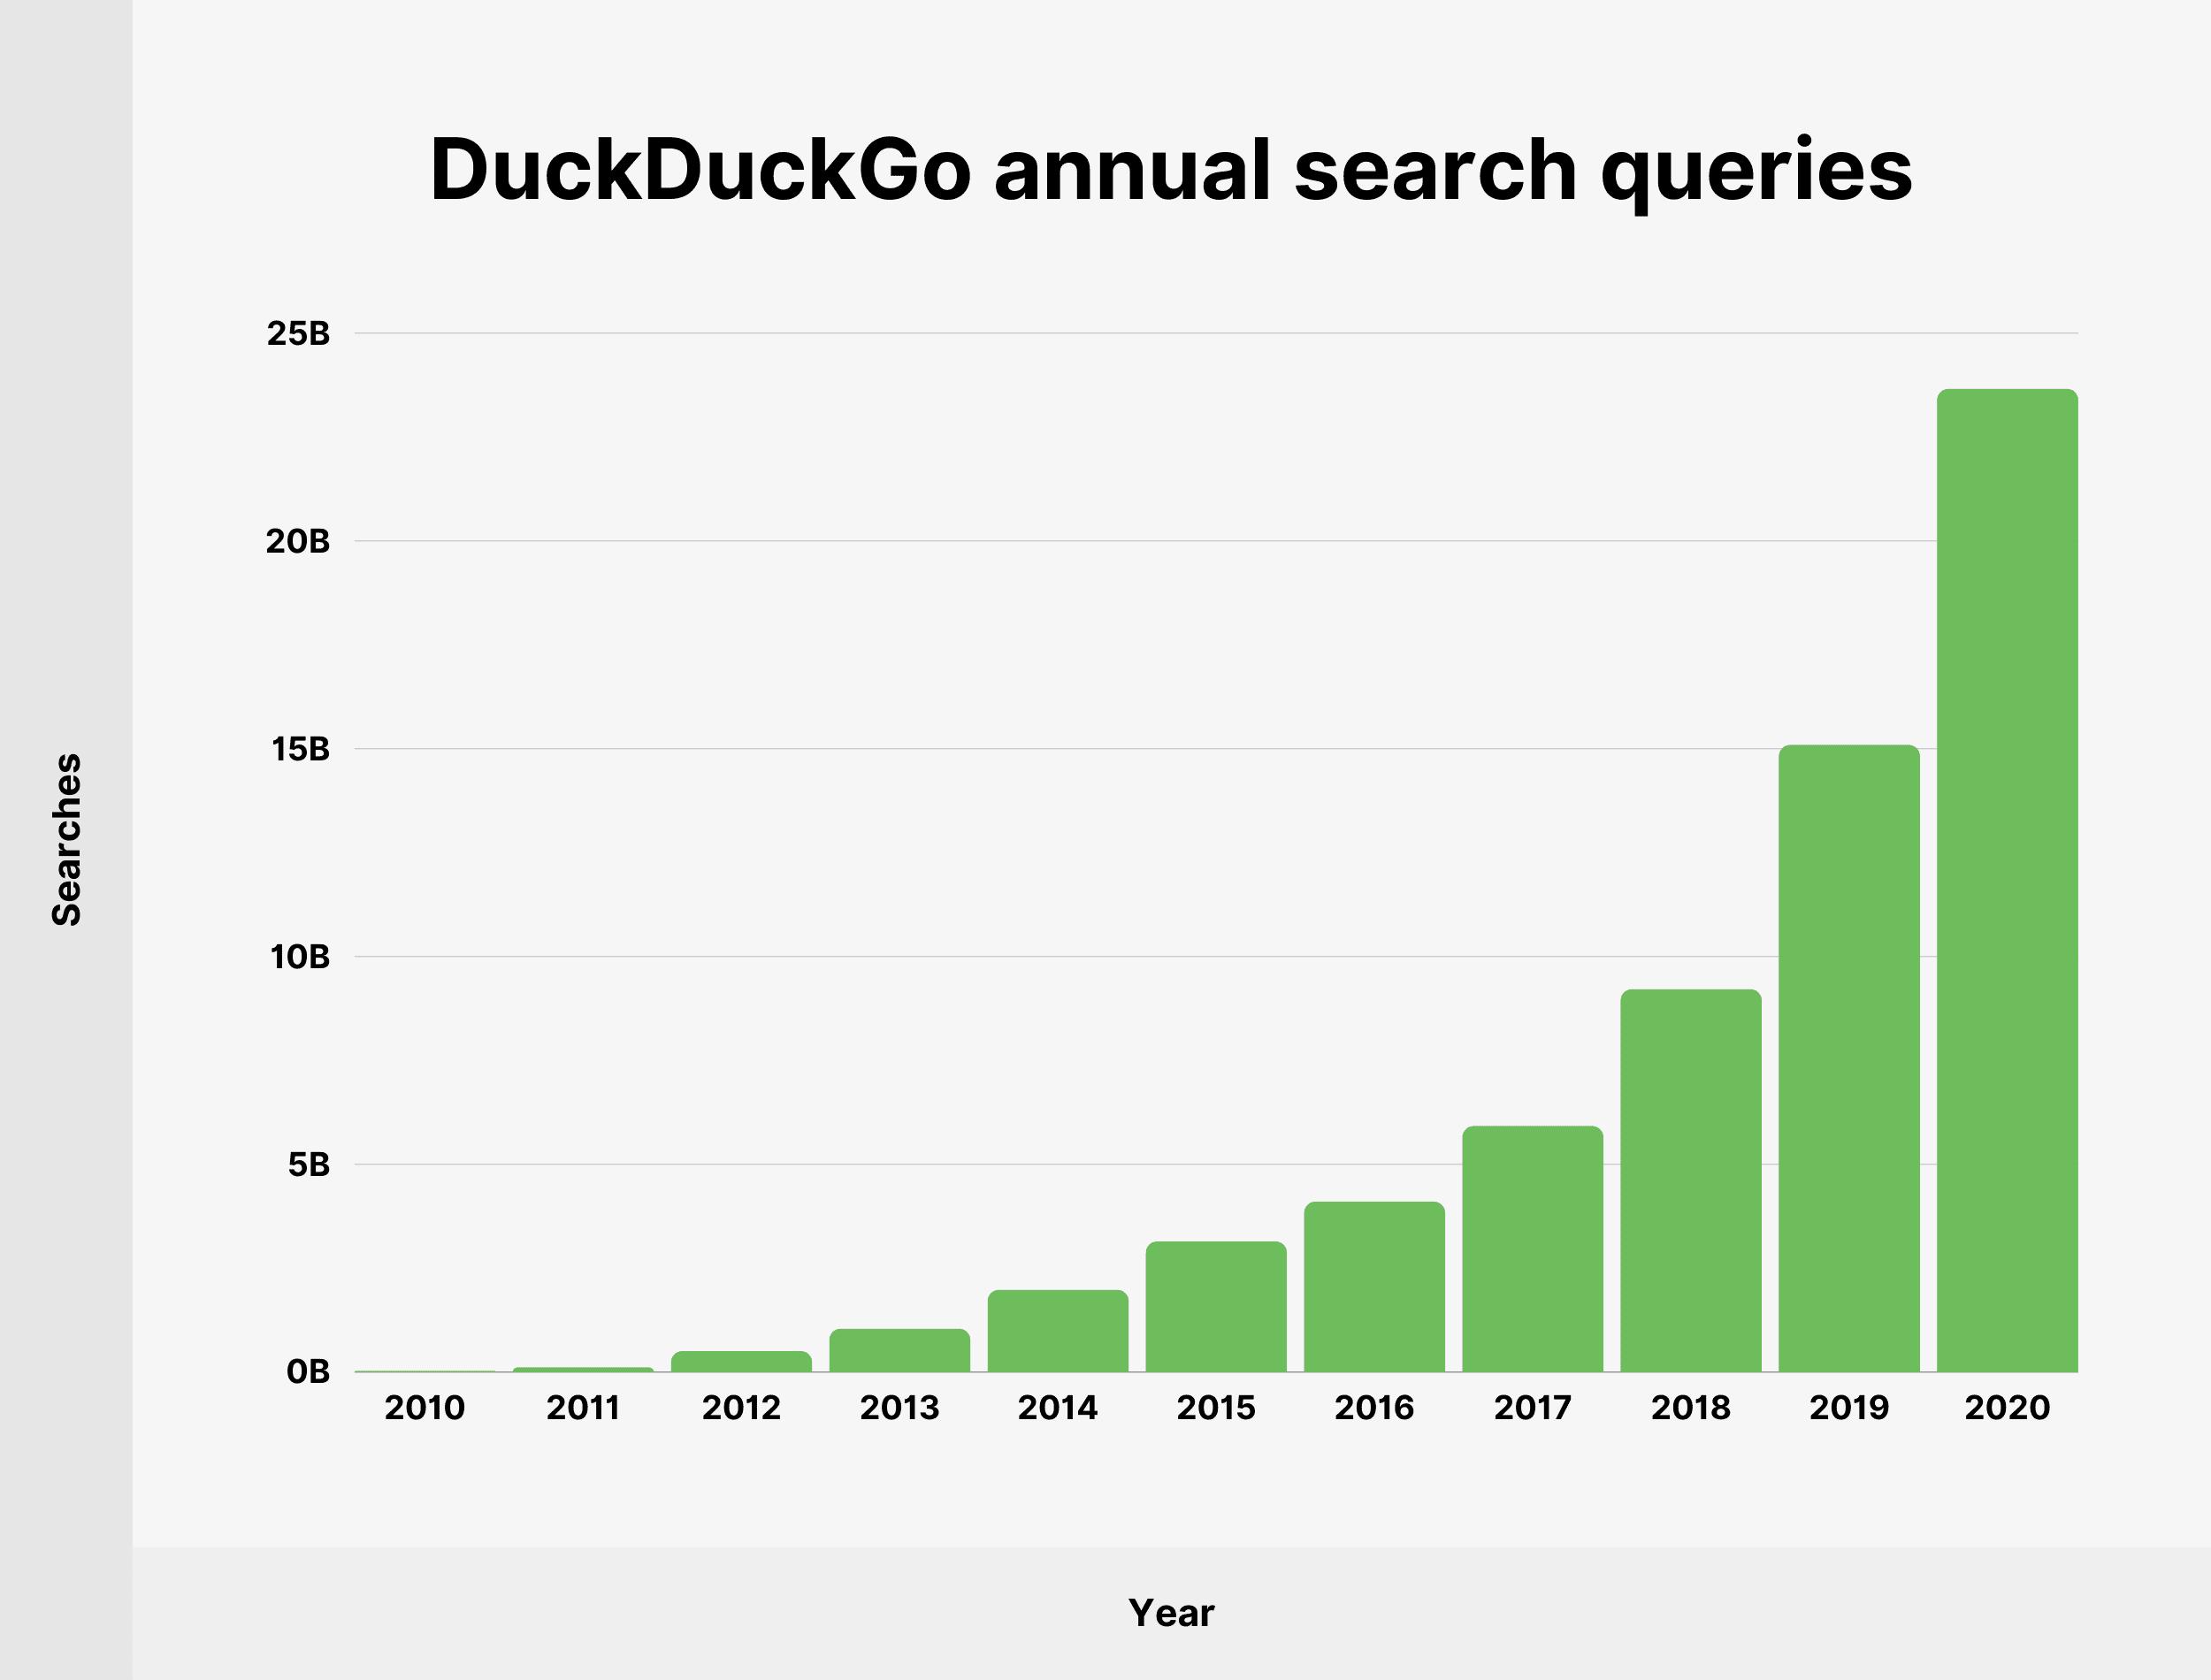 DuckDuckGo annual search queries